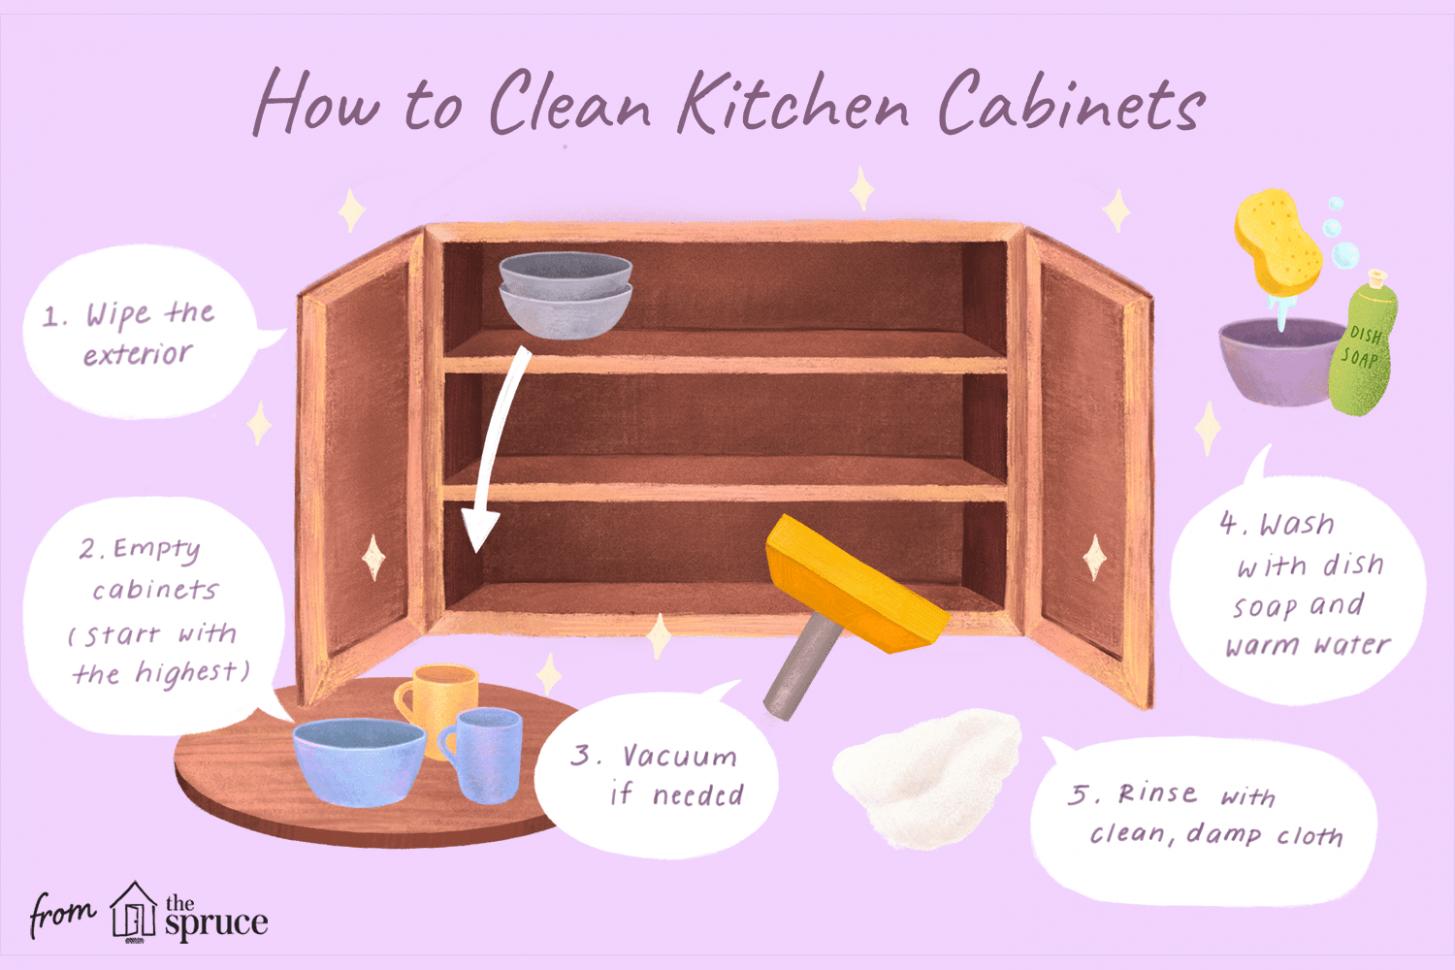 Best Diy Kitchen Cabinet Cleaner Cabinet Cleaner Diy Kitchen Cabinet Cleaner Cleaner In 2020 Clean Kitchen Cabinets Old Kitchen Cabinets Laminate Kitchen Cabinets